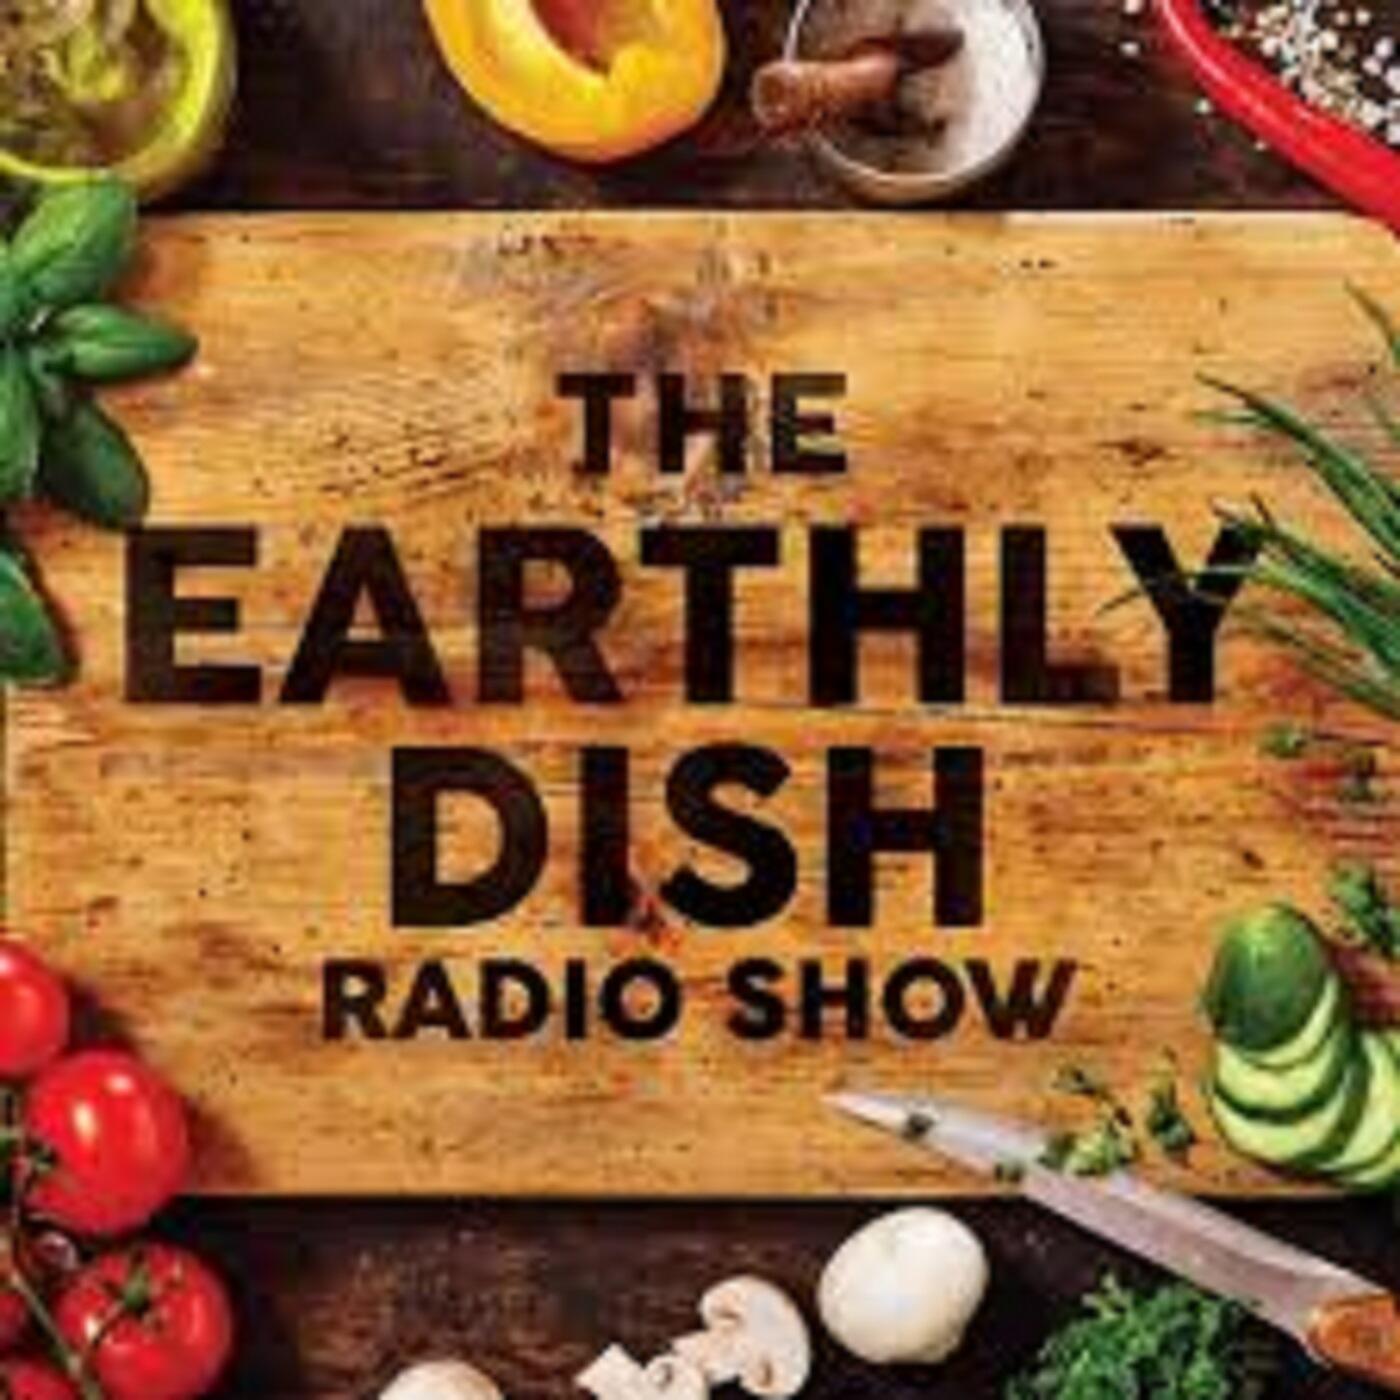 The Earthly Dish Radio Show